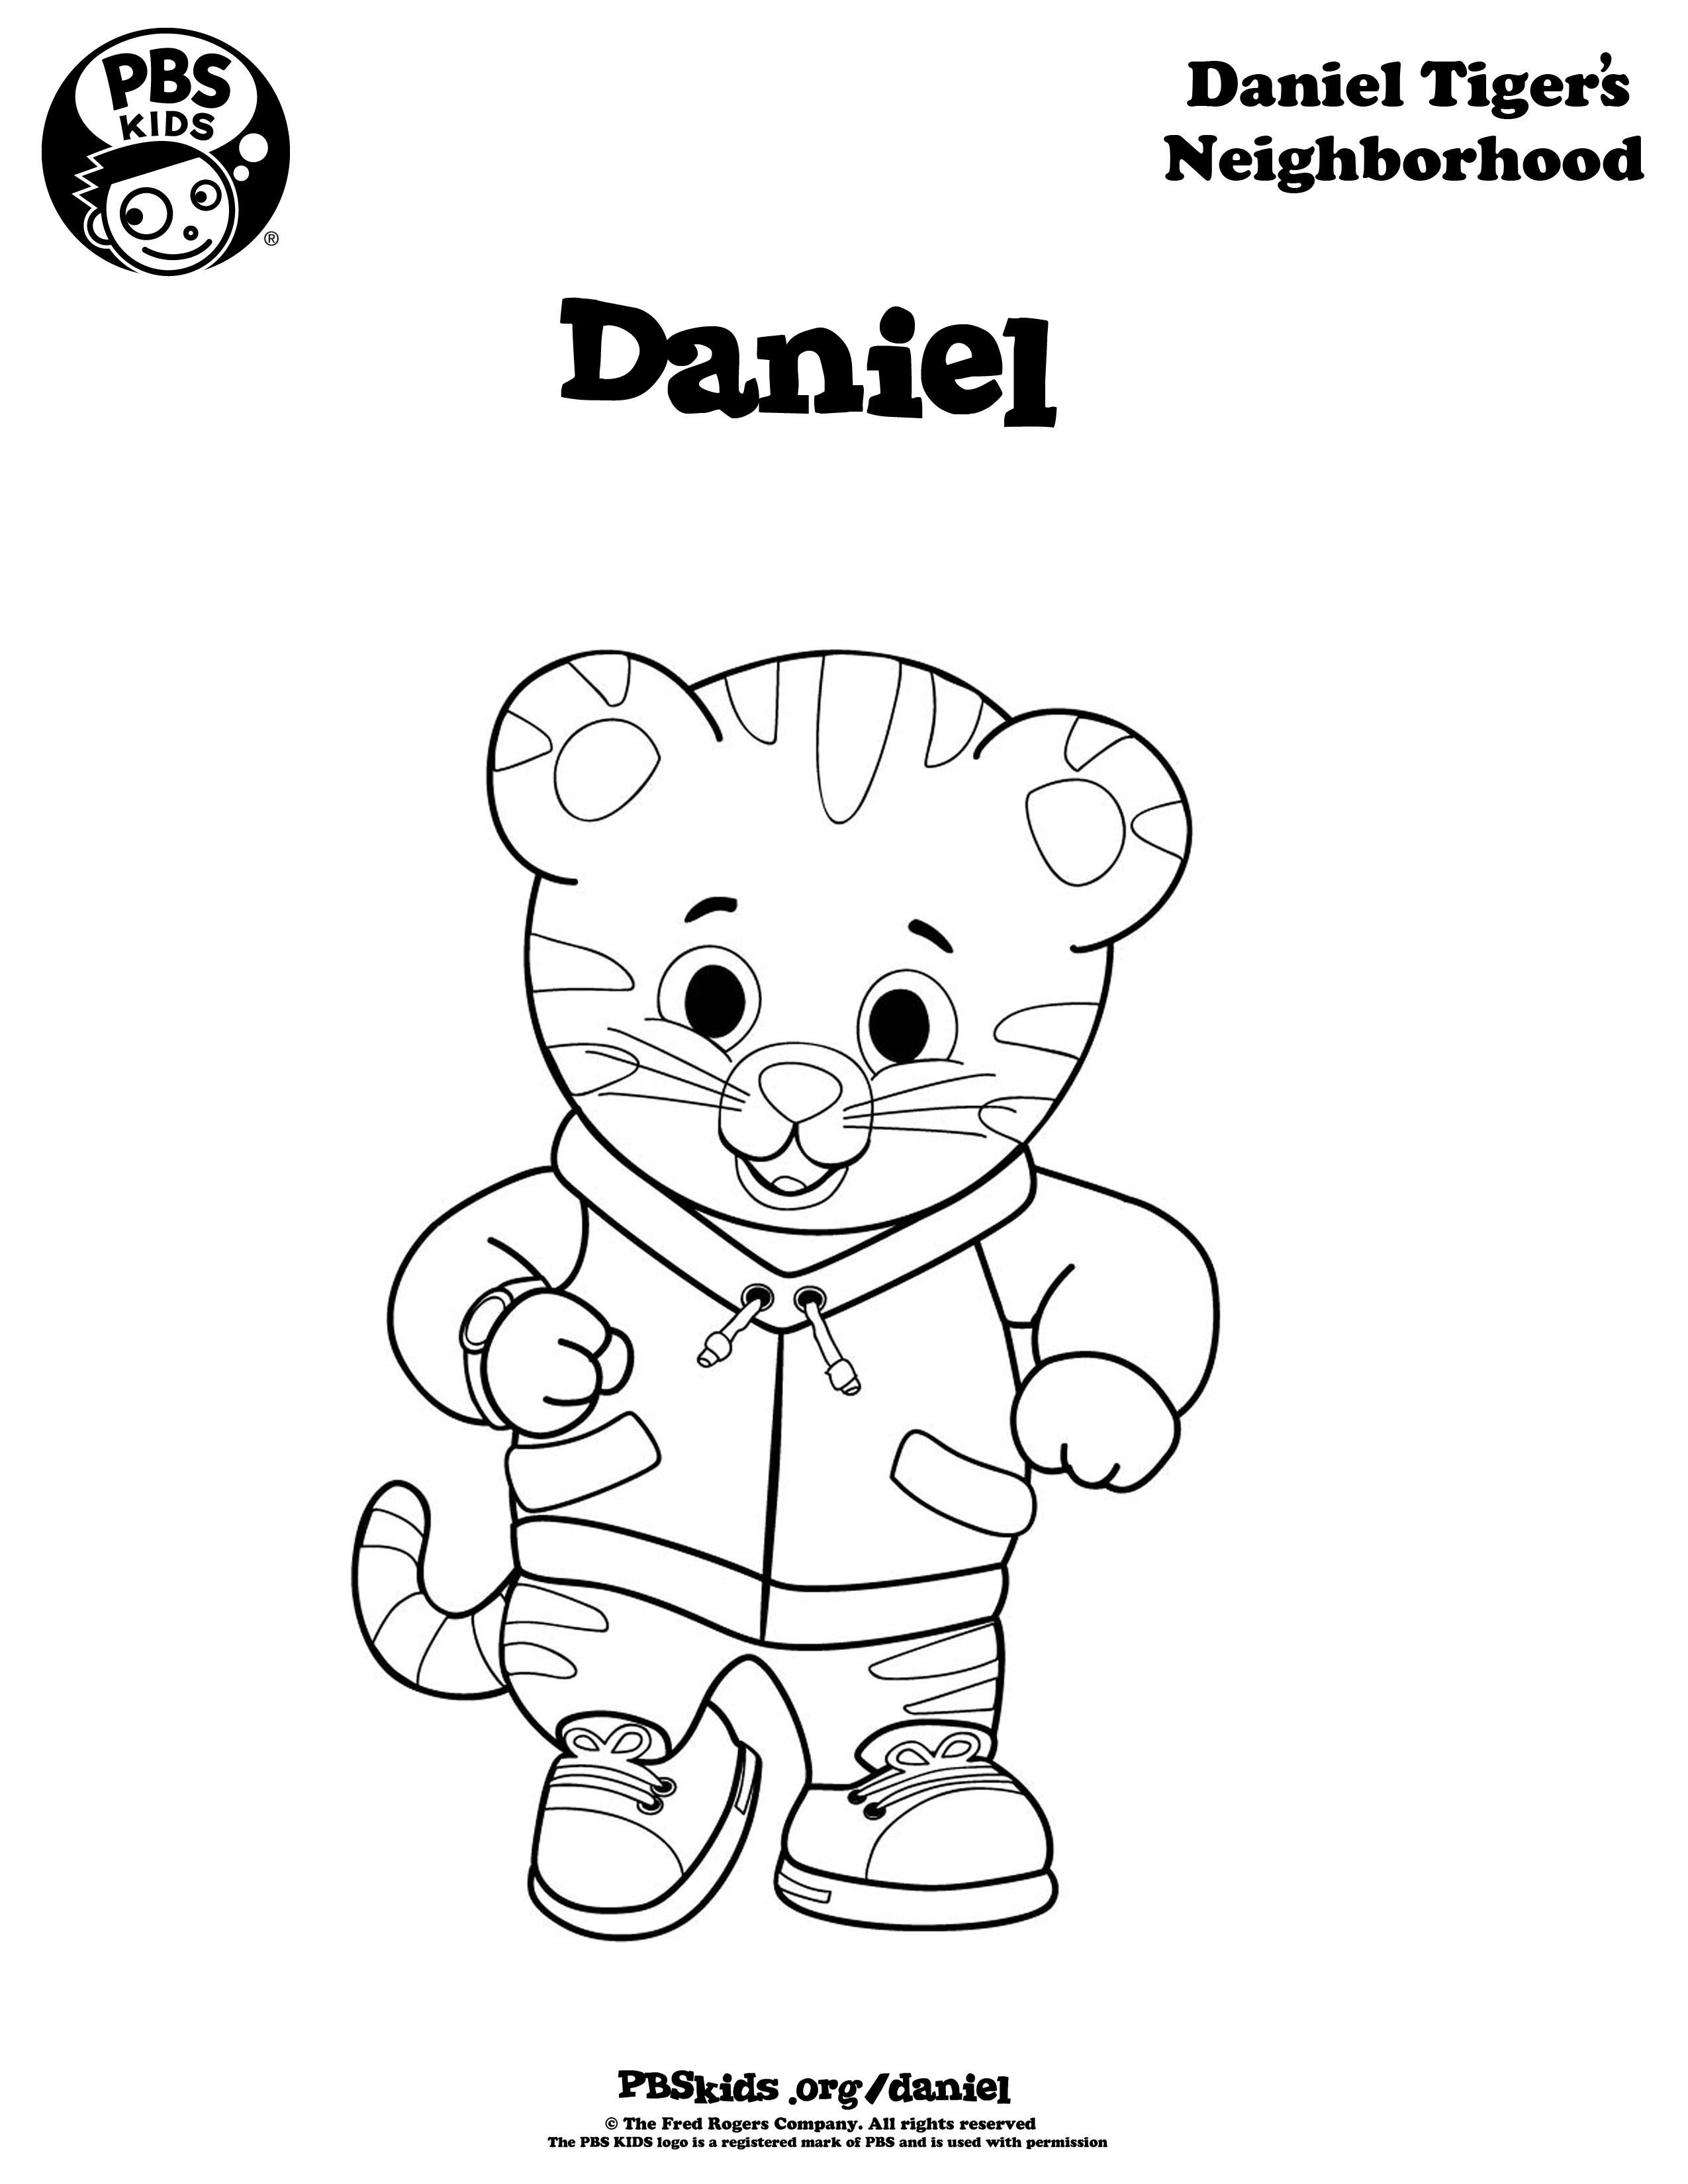 Find Tigertastic Daniel Tiger Printables Online Pbs Kids Daniel